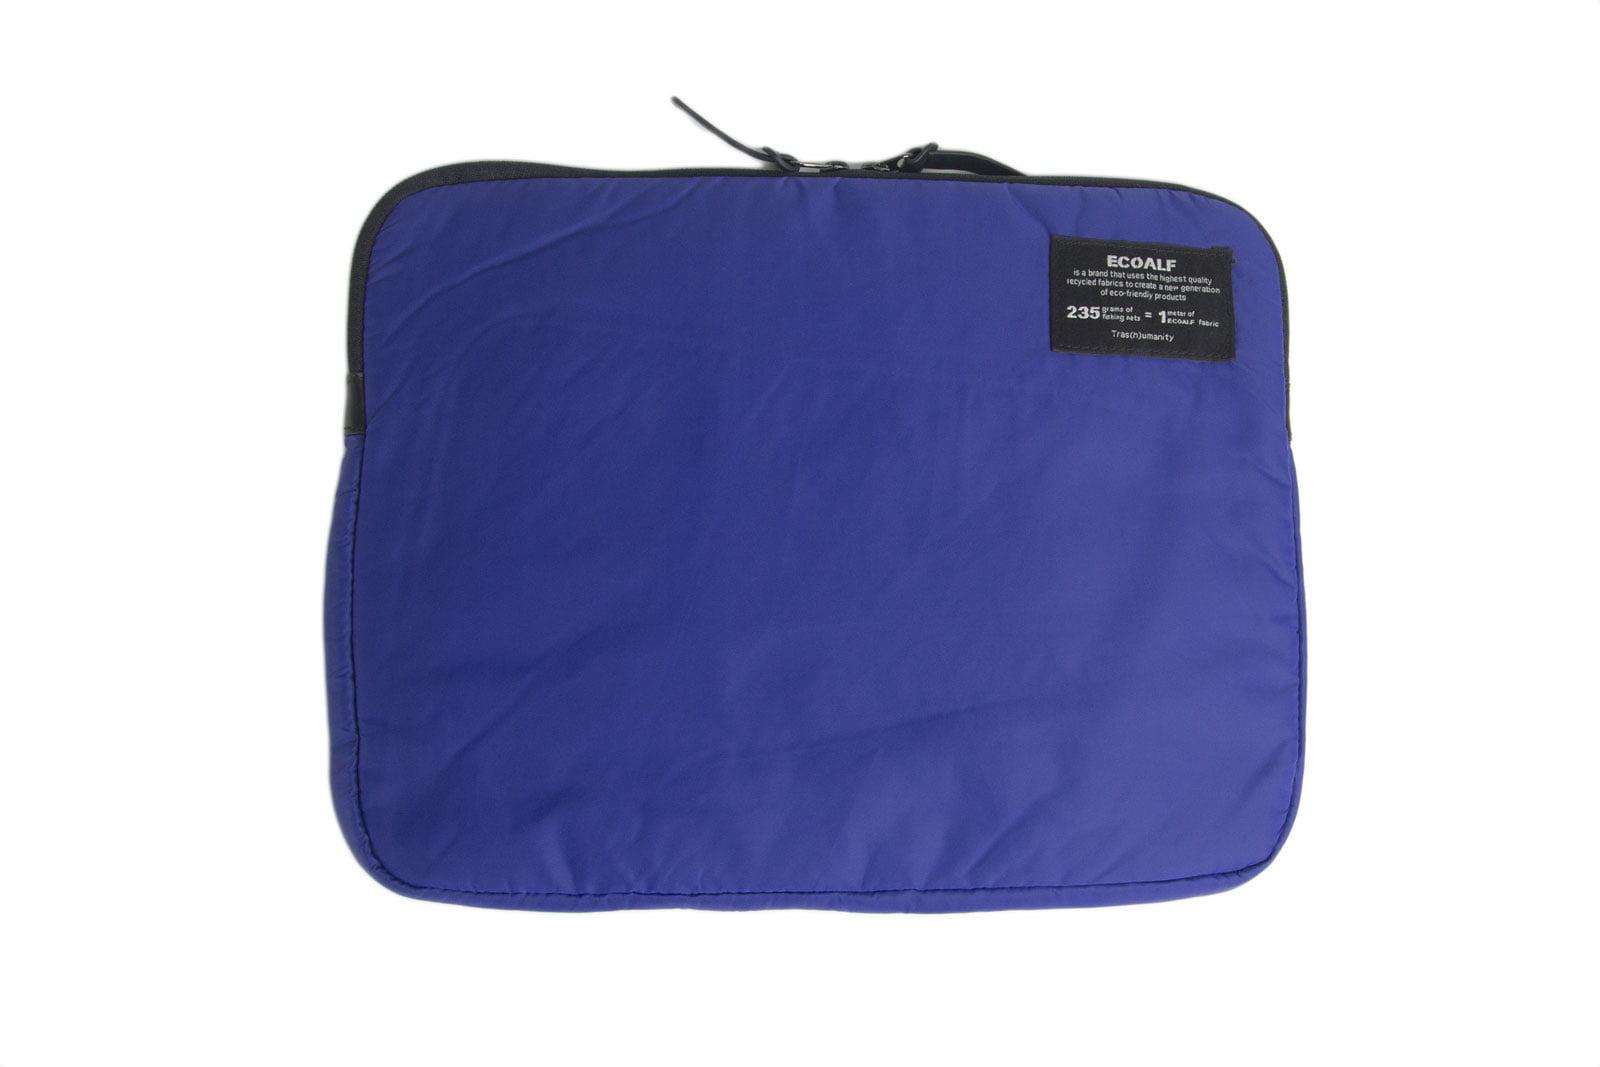 ECOALF Royal Blue MacBook Air Pro Zip Around Closure Solid Case by ECOALF